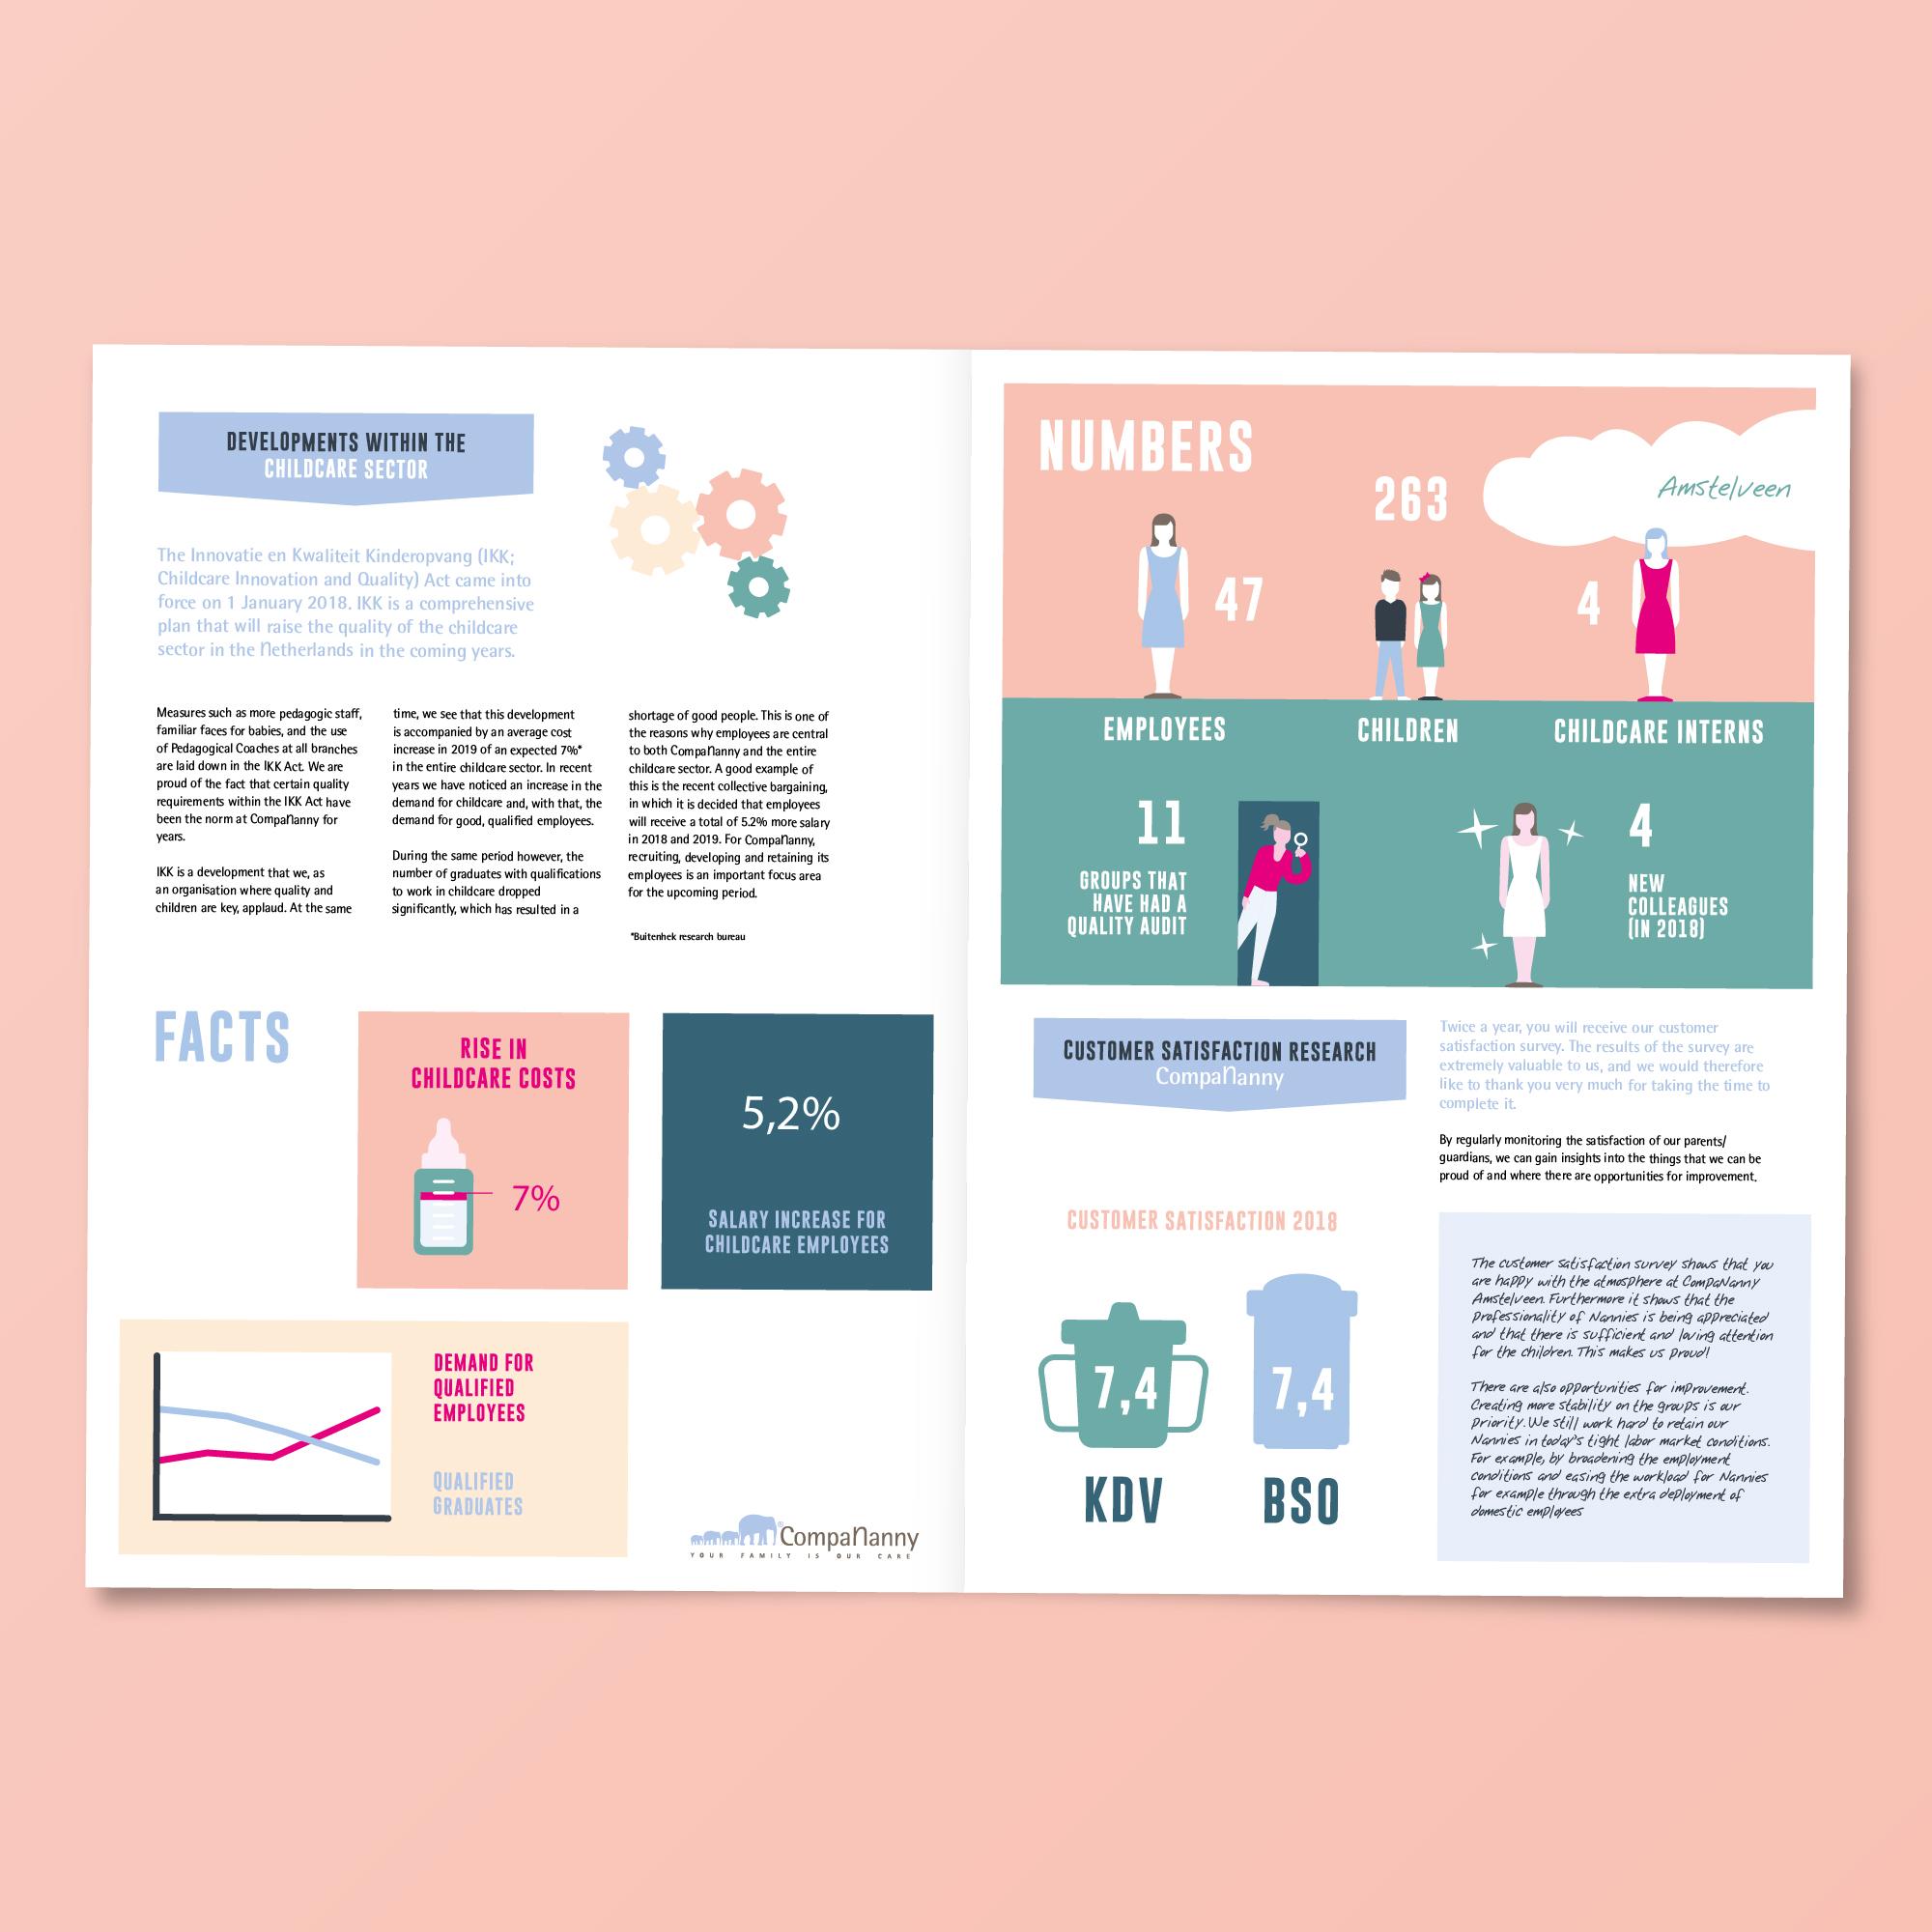 portfolio-dimgray-compananny-infographic-nannies-2